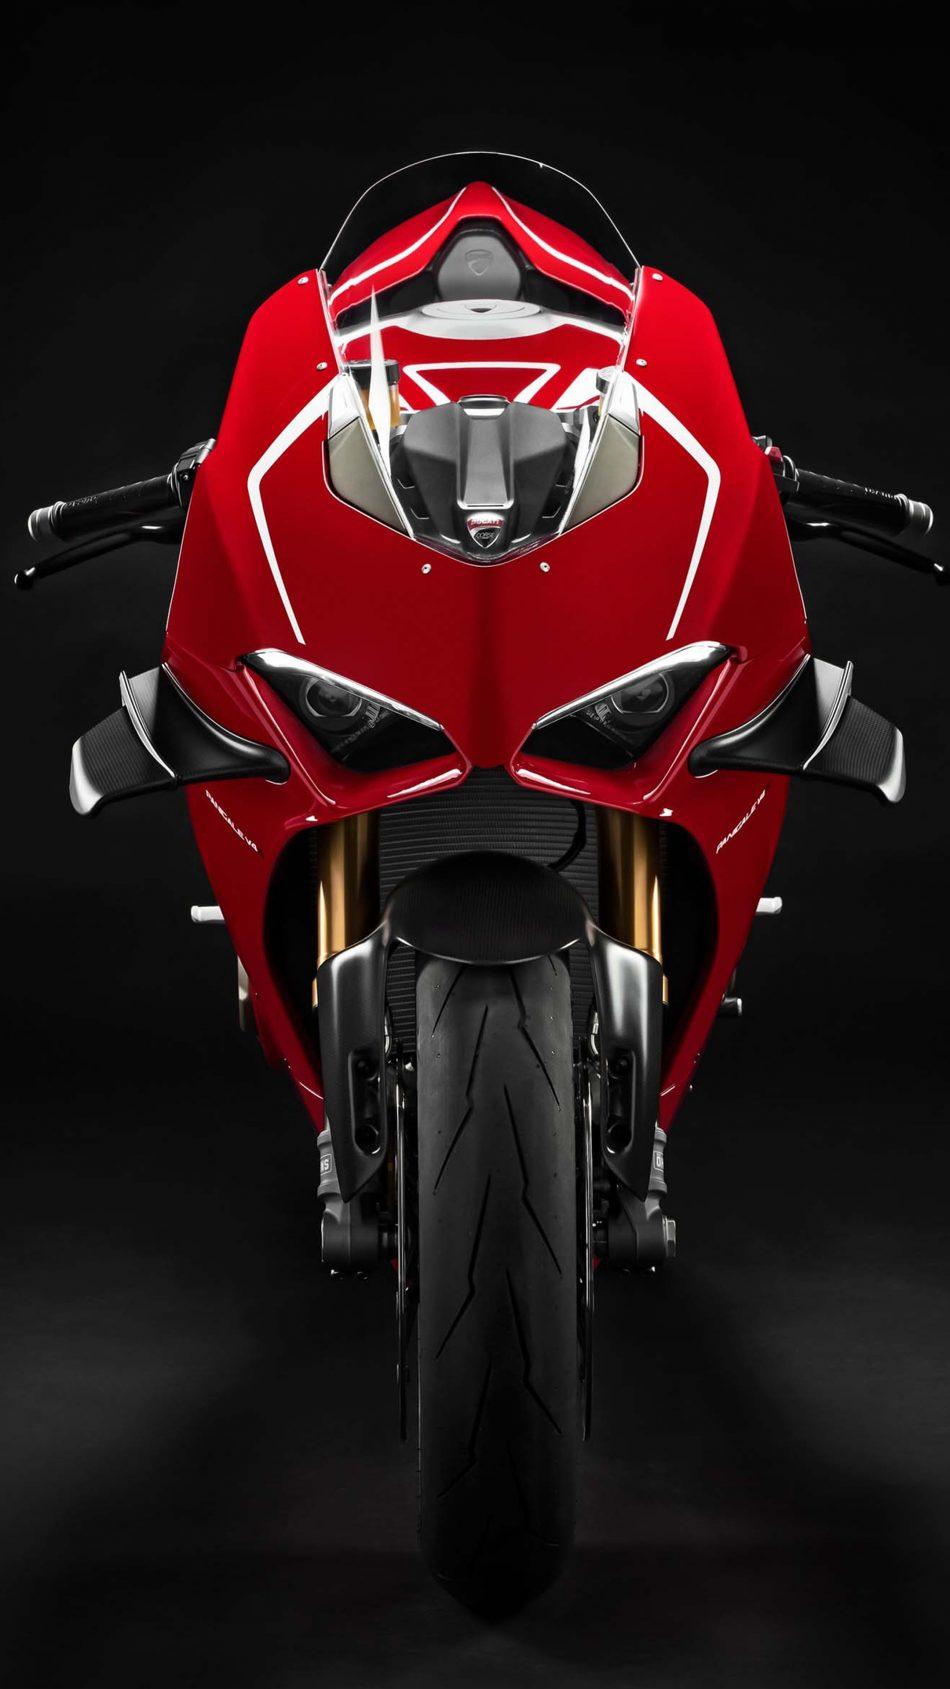 Ducati Panigale V4 R 4K Ultra HD Mobile Wallpaper